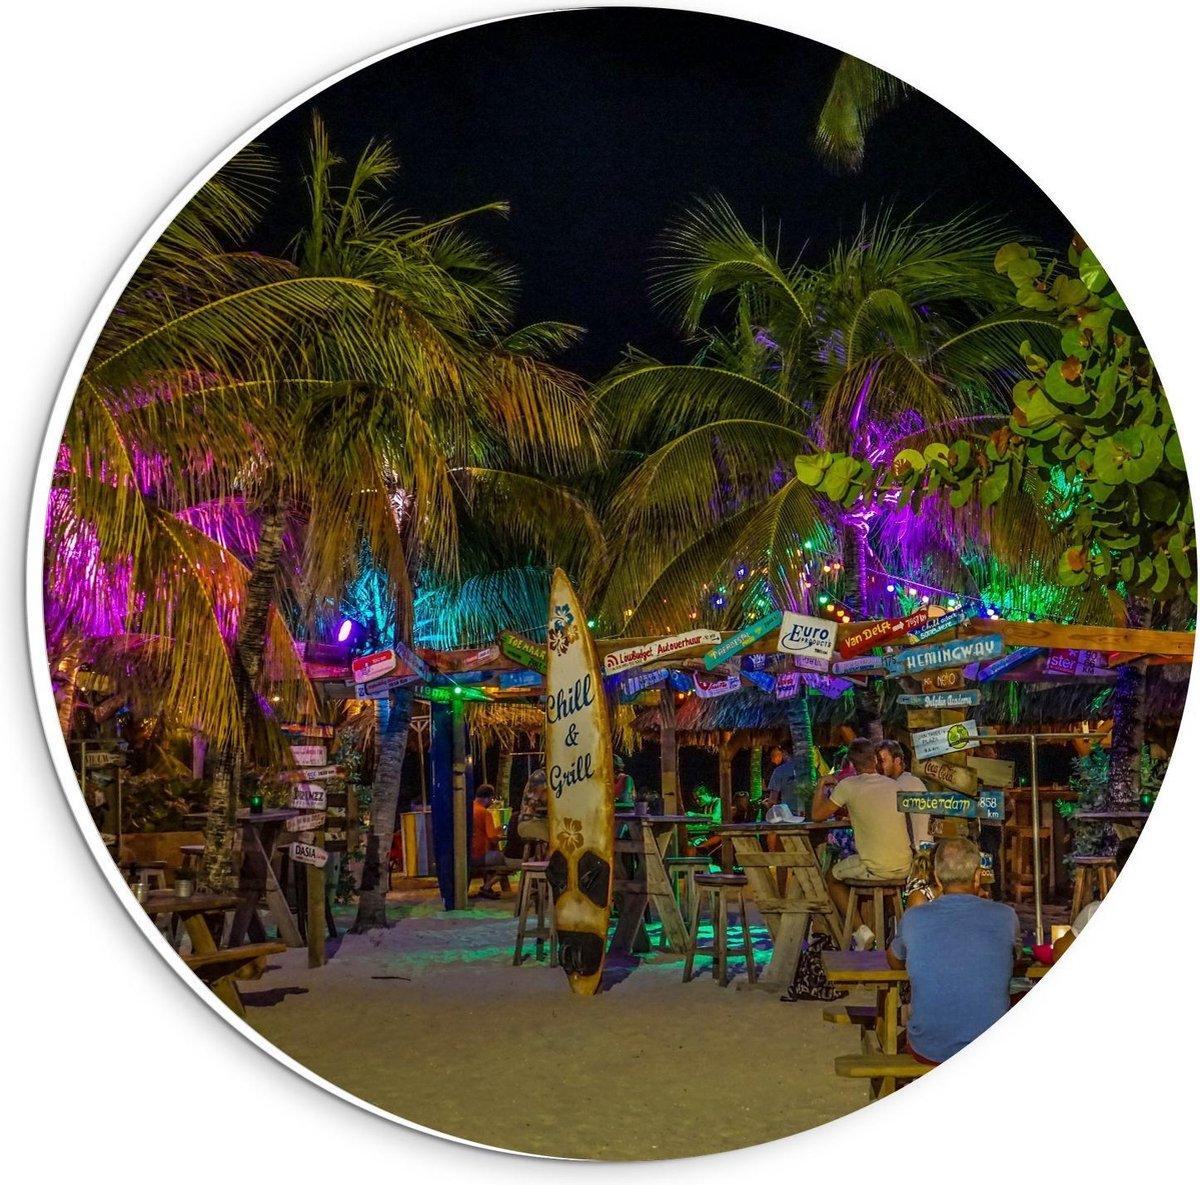 Forex Wandcirkel - Beachclubje in de Nacht - 20x20cm Foto op Wandcirkel (met ophangsysteem)